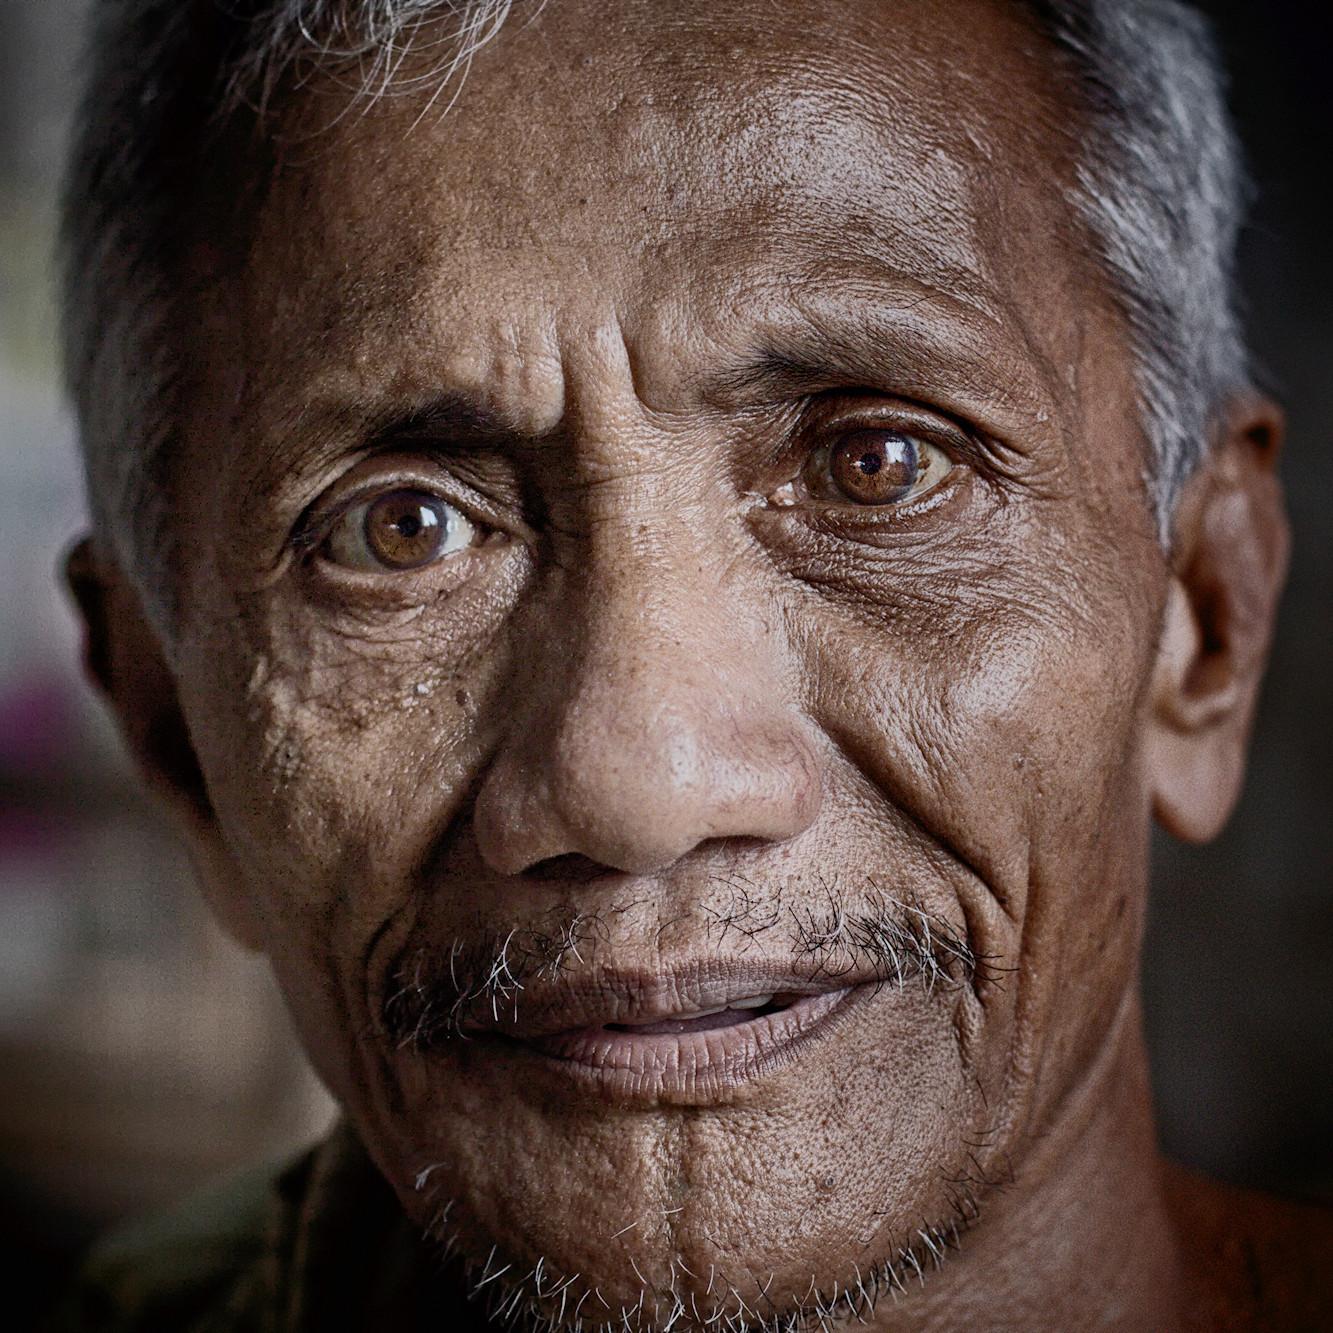 [Portraits] Tanete Img_7013